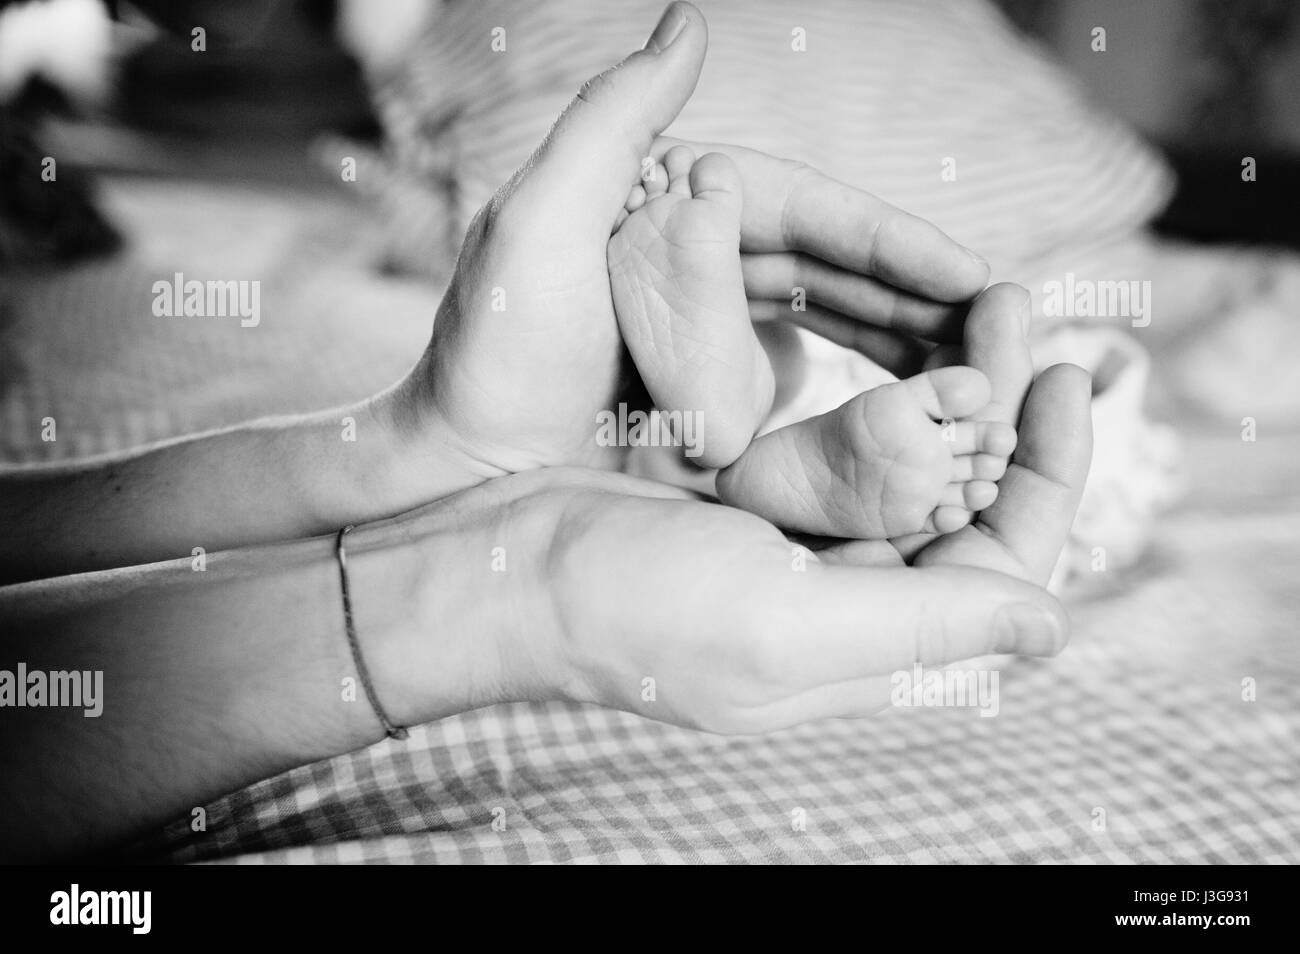 Baby little pink feet in parent hands - Stock Image